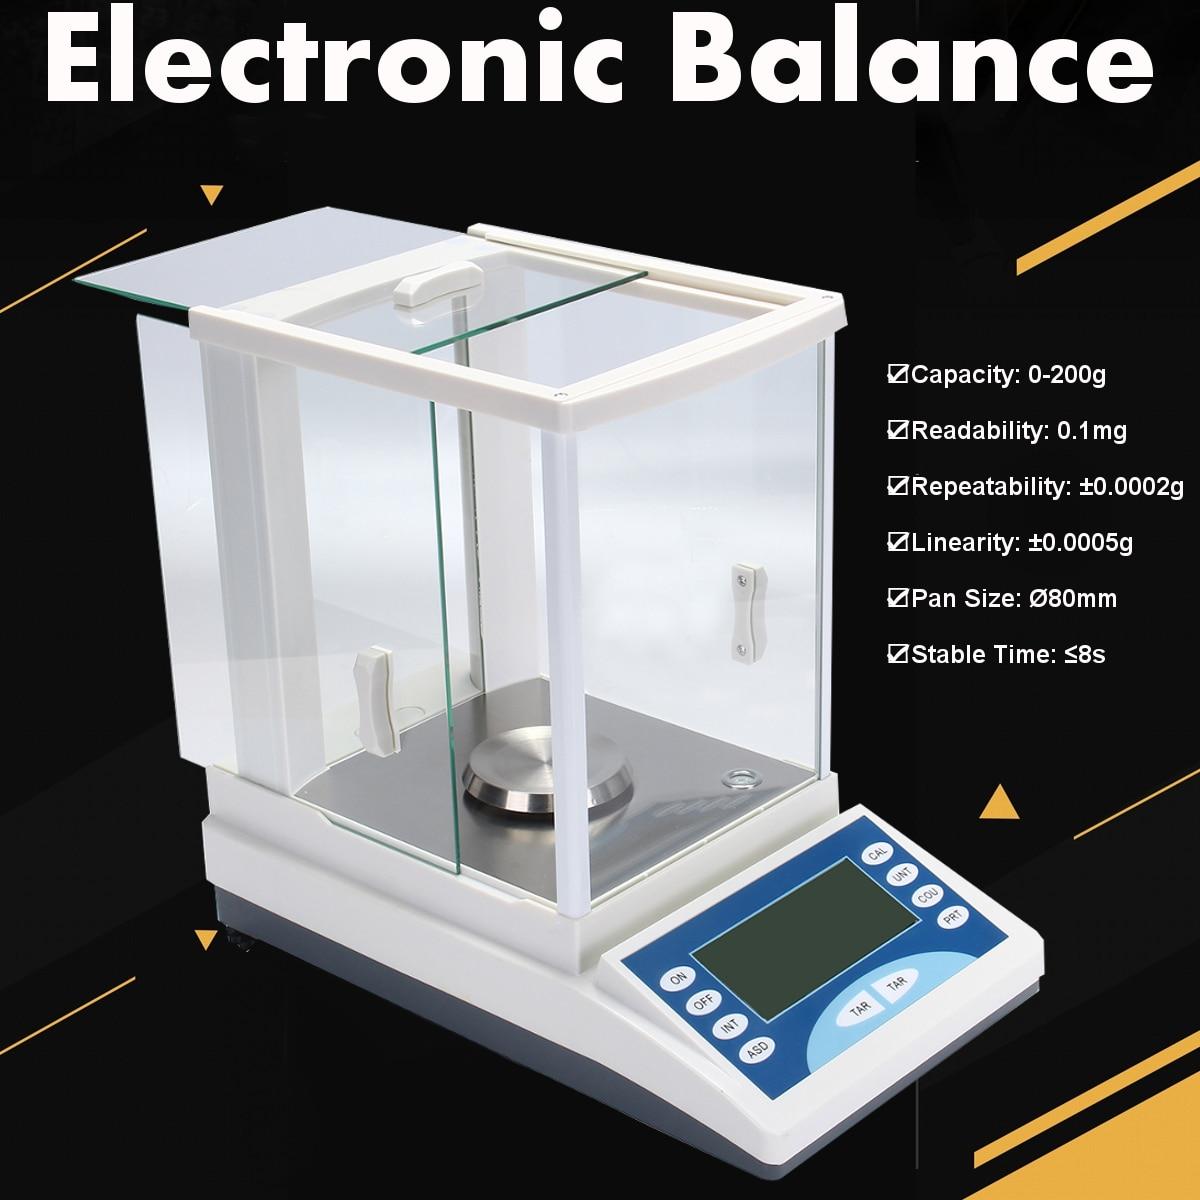 ZEAST 200 / 0.0001g 0.1mg 100-240V Digital Precision Scale Lab Analytical Balance Electronic Balance Aluminum Alloy Base hc b20001 electronic analytical balance digital balance lab balance 2kg range 0 1g resolution